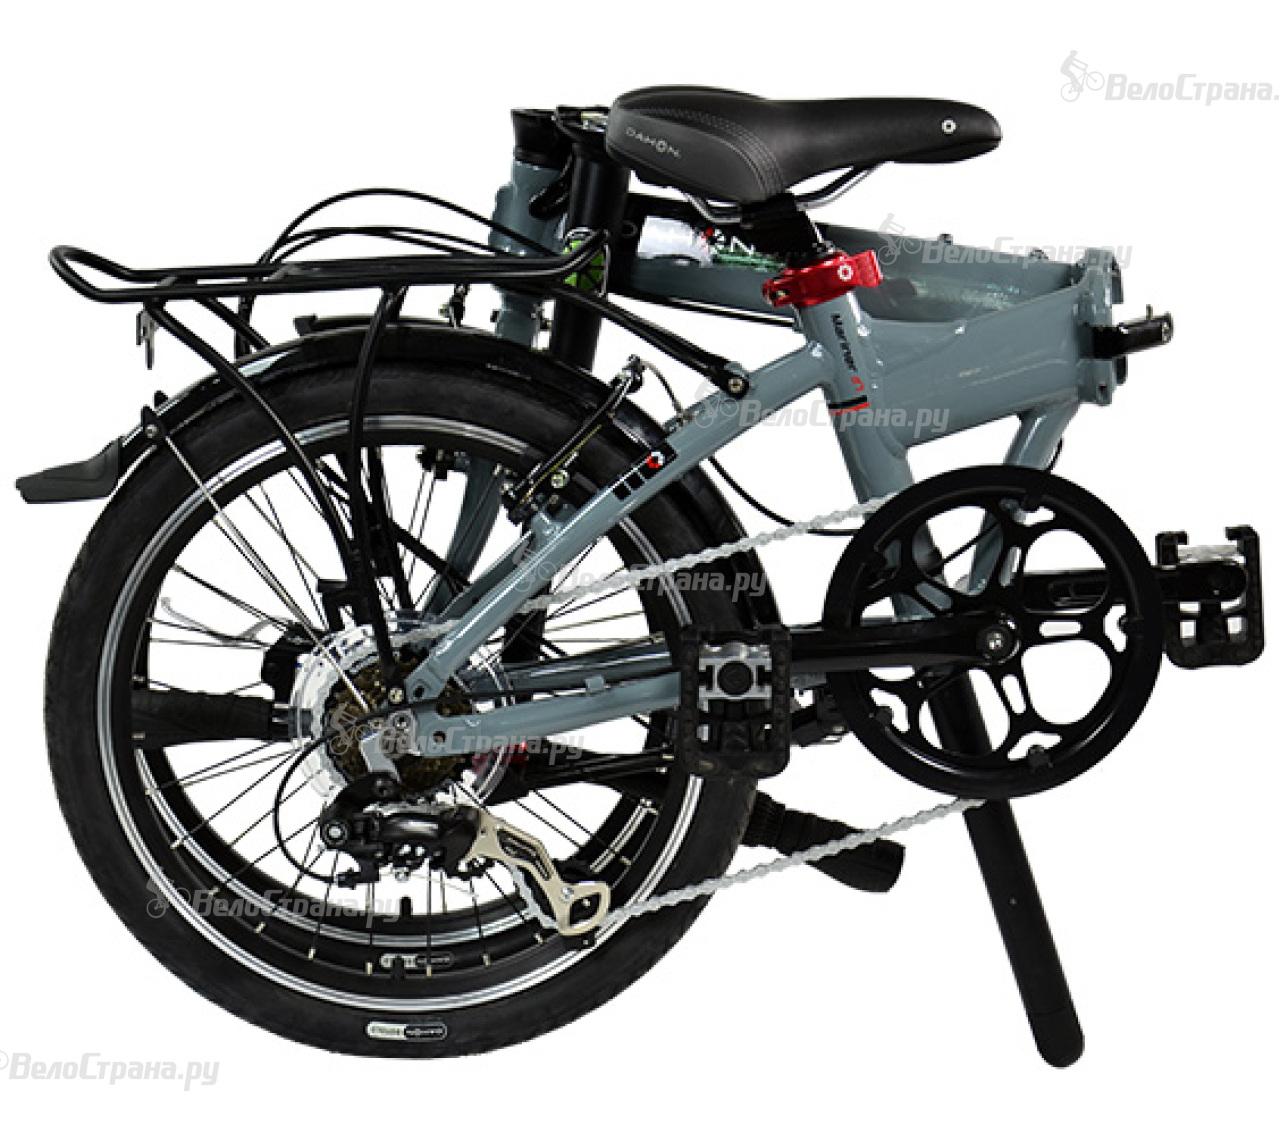 Велосипед Dahon Mariner D7 20 (2017) велосипед dahon speed d7 2014